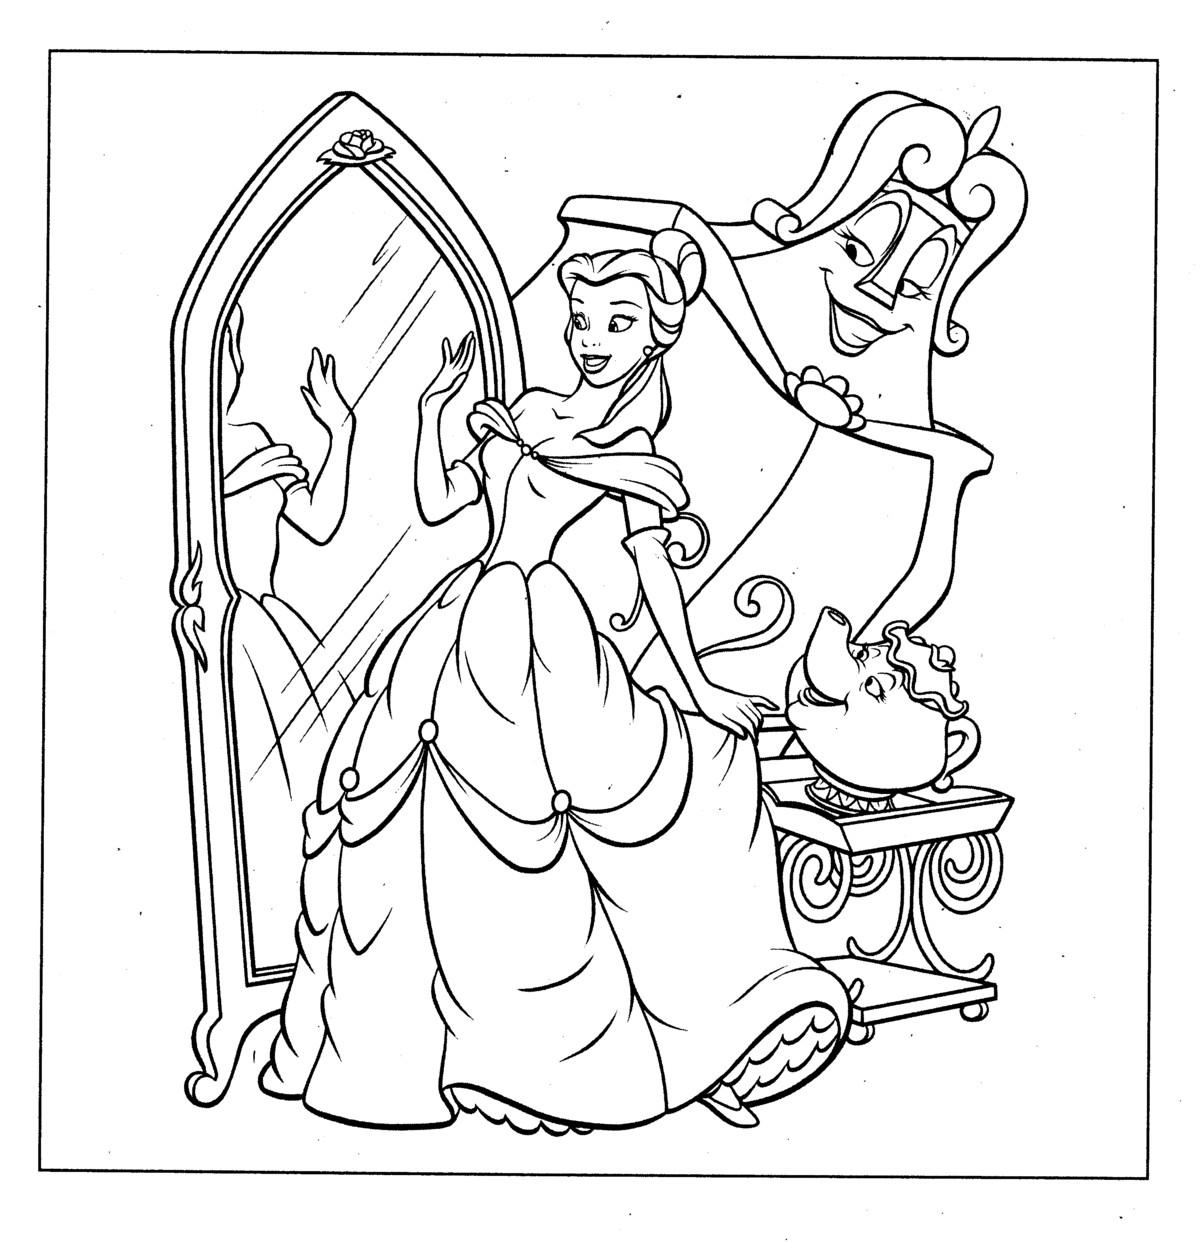 princess coloring page disney princess coloring pages minister coloring princess coloring page 1 1